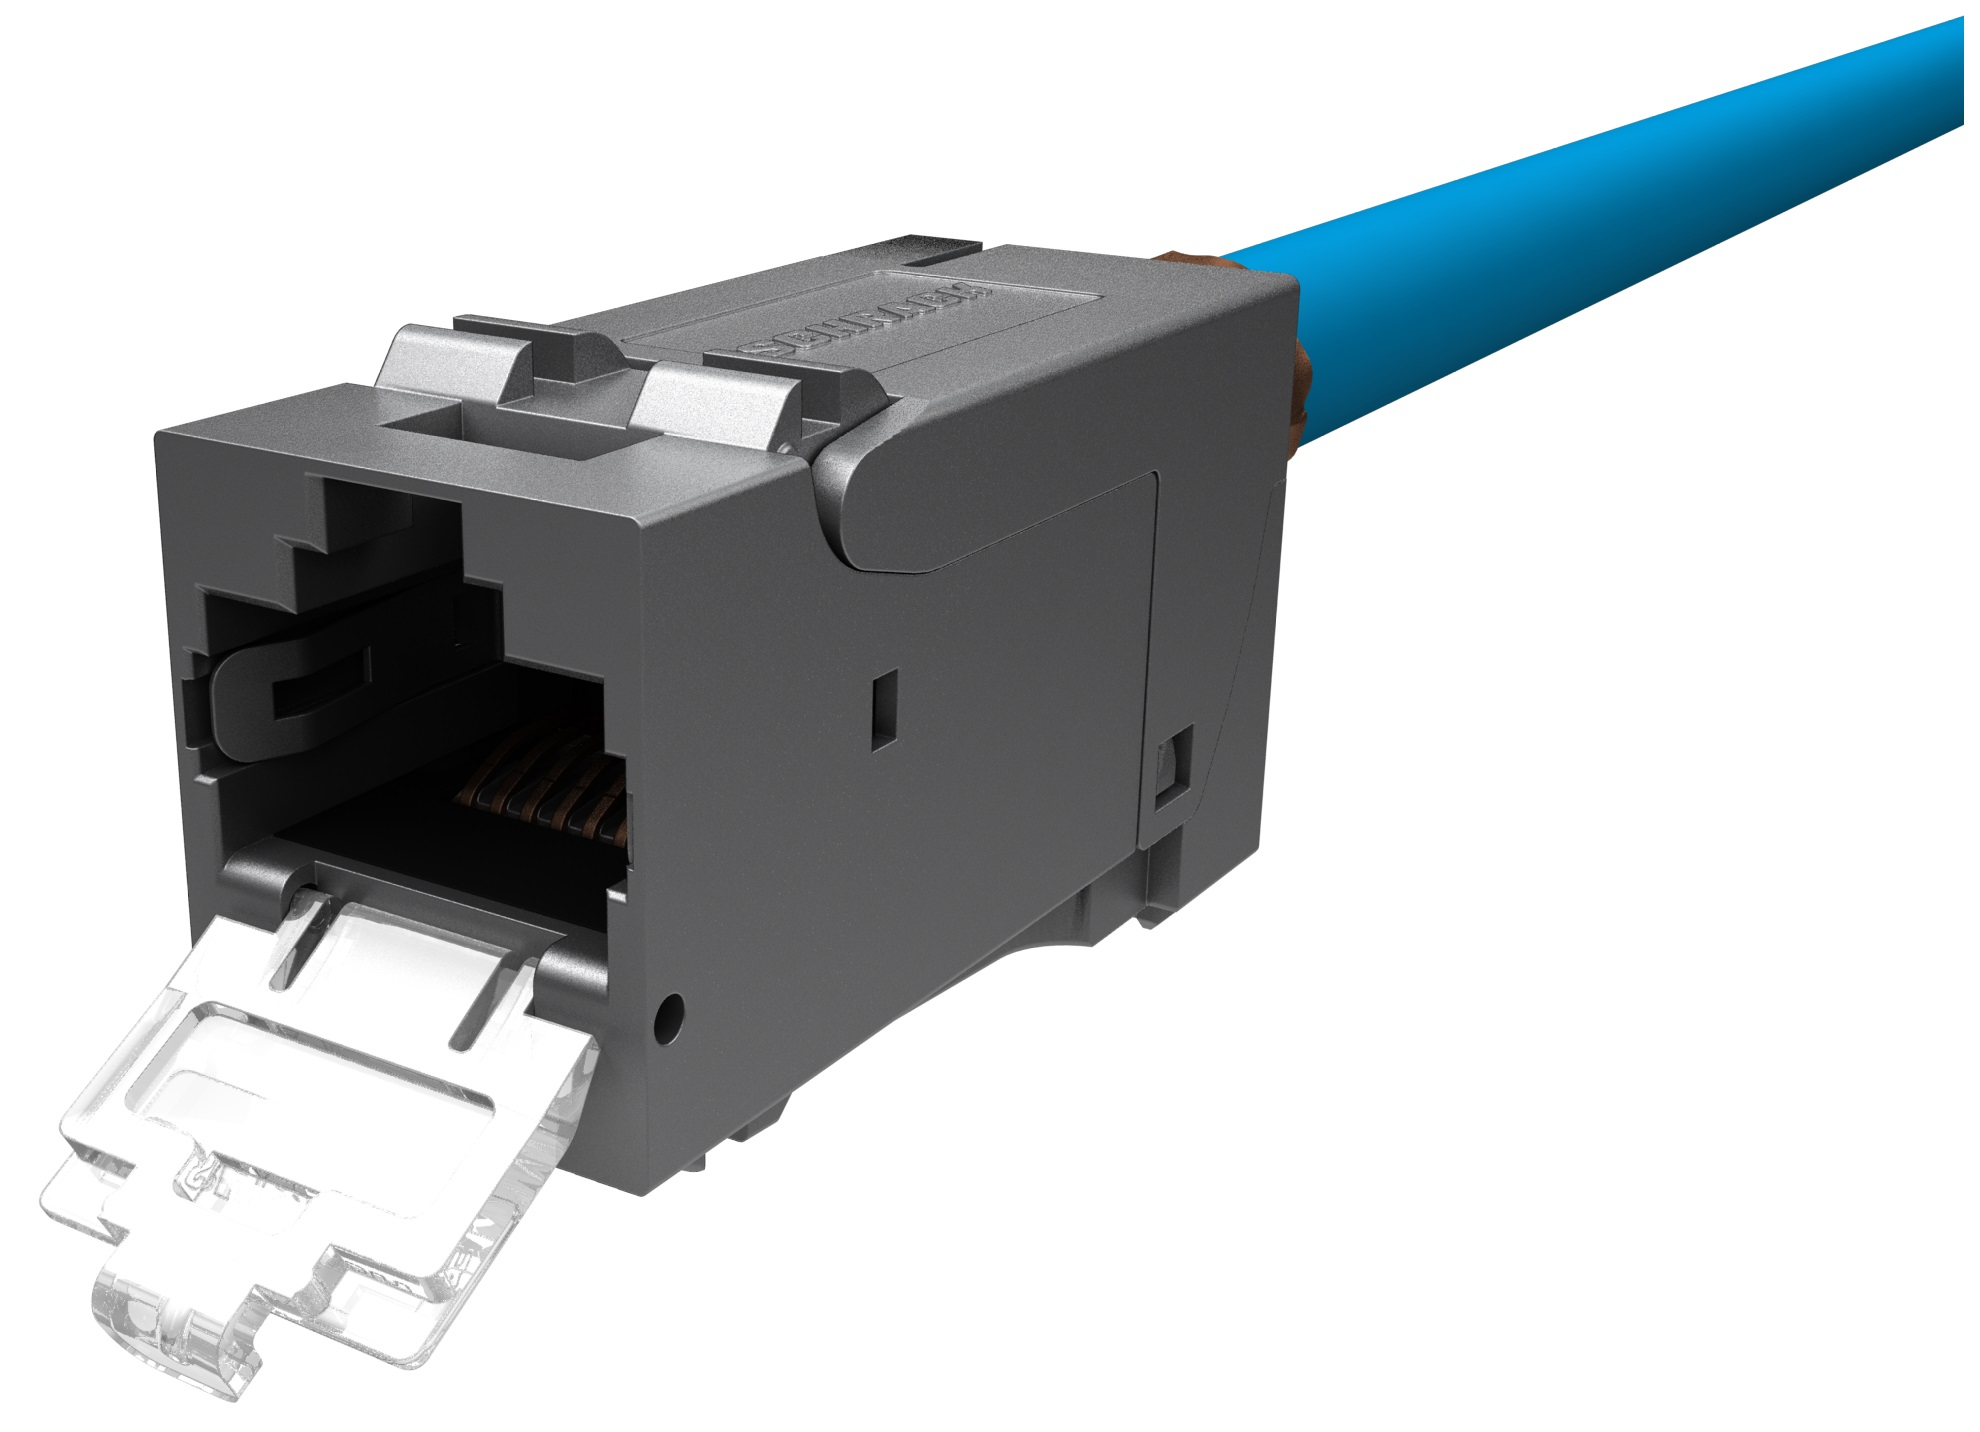 1 Stk PERFORMANCE LINE Buchse RJ45 geschirmt Klasse Ea 10GB PoE+ HSPMRJ6G1T